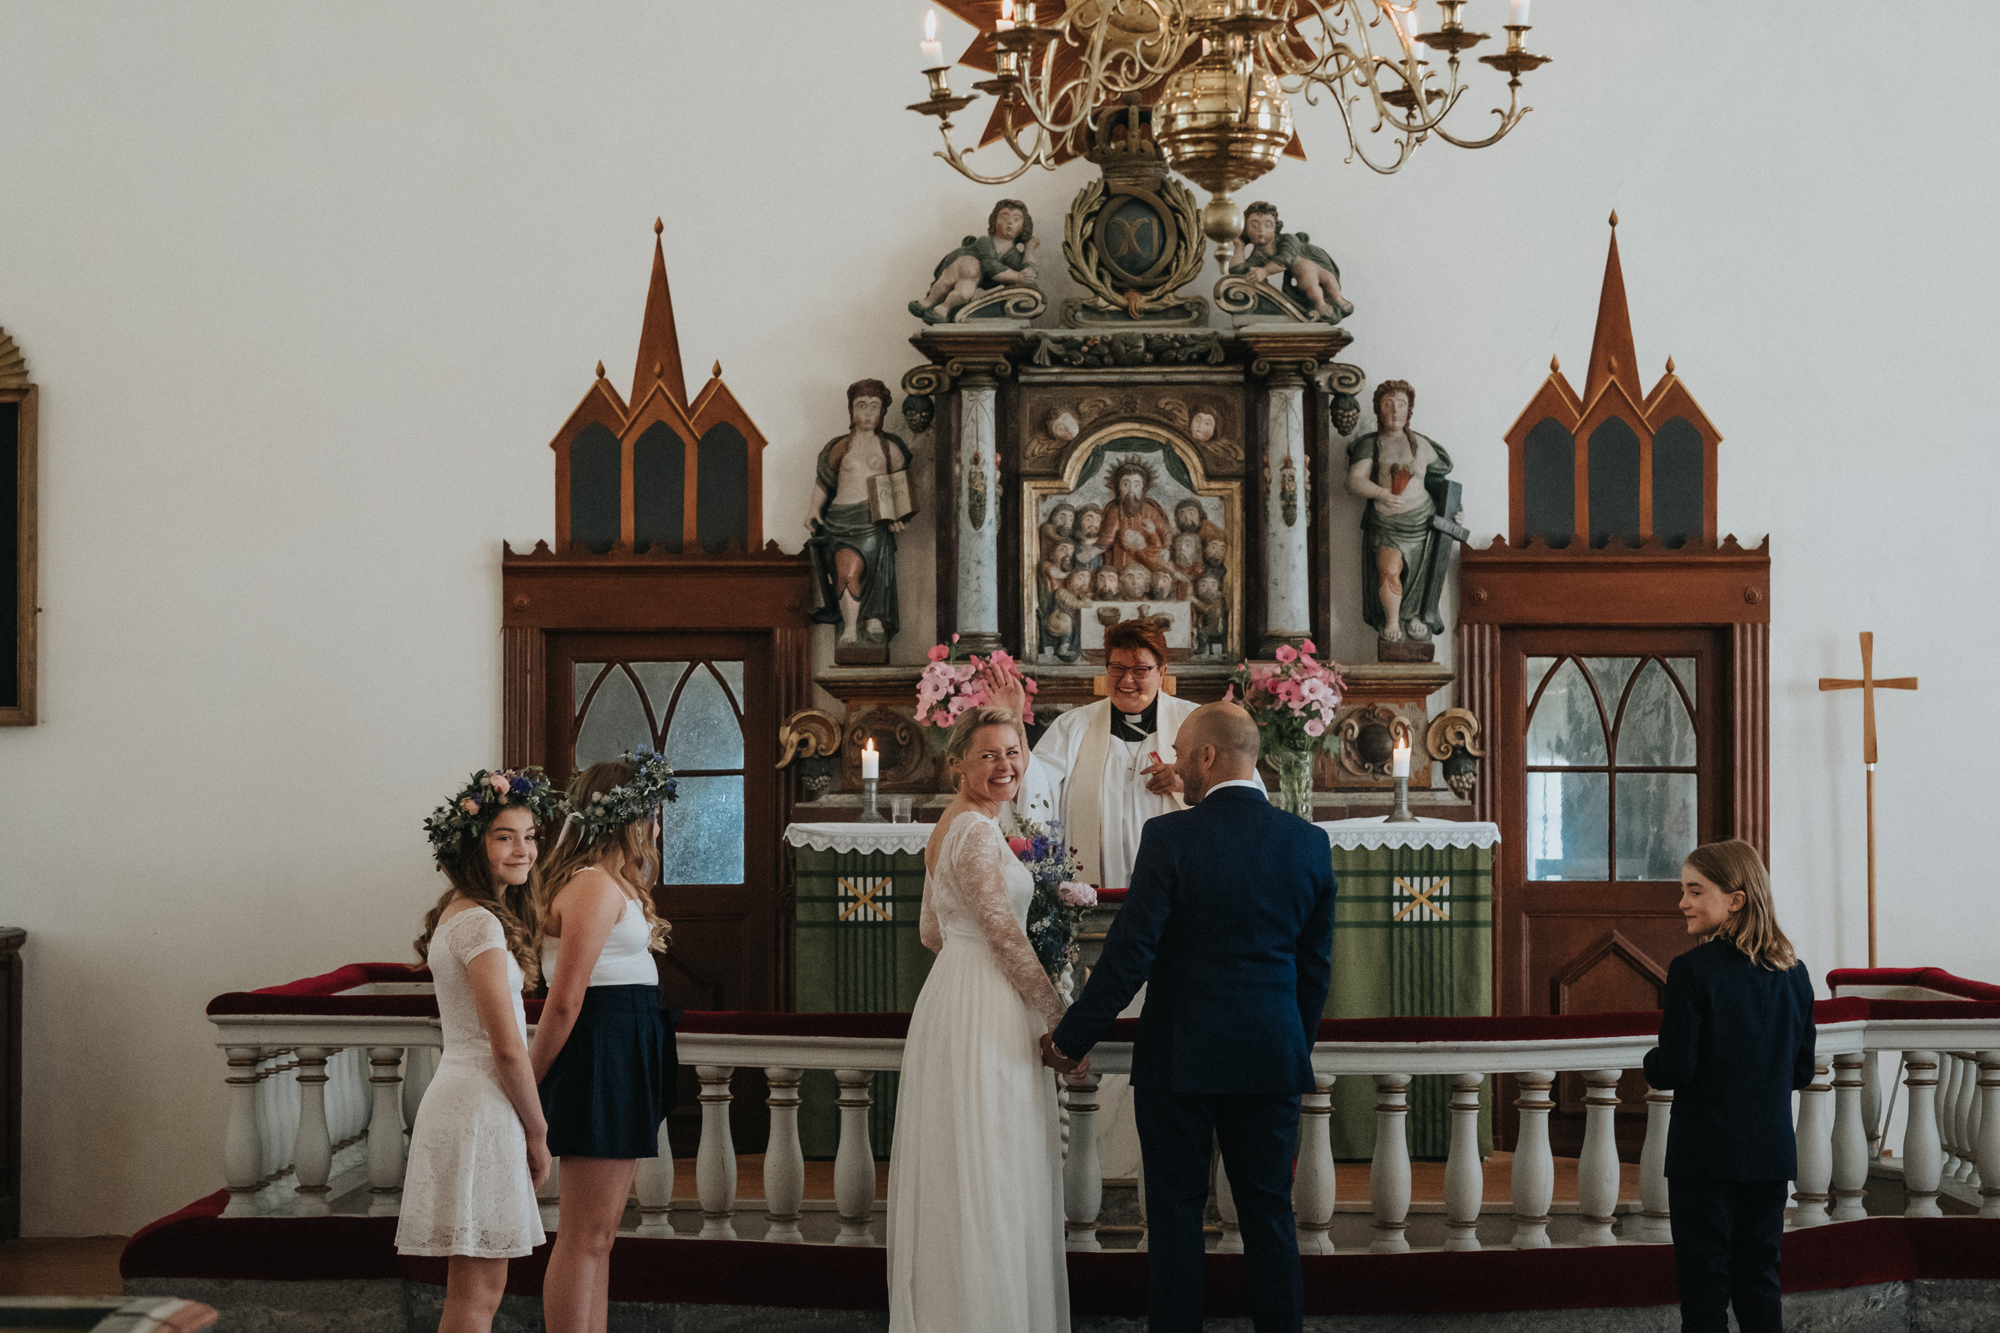 016-bröllop-fårö-neas-fotografi.jpg